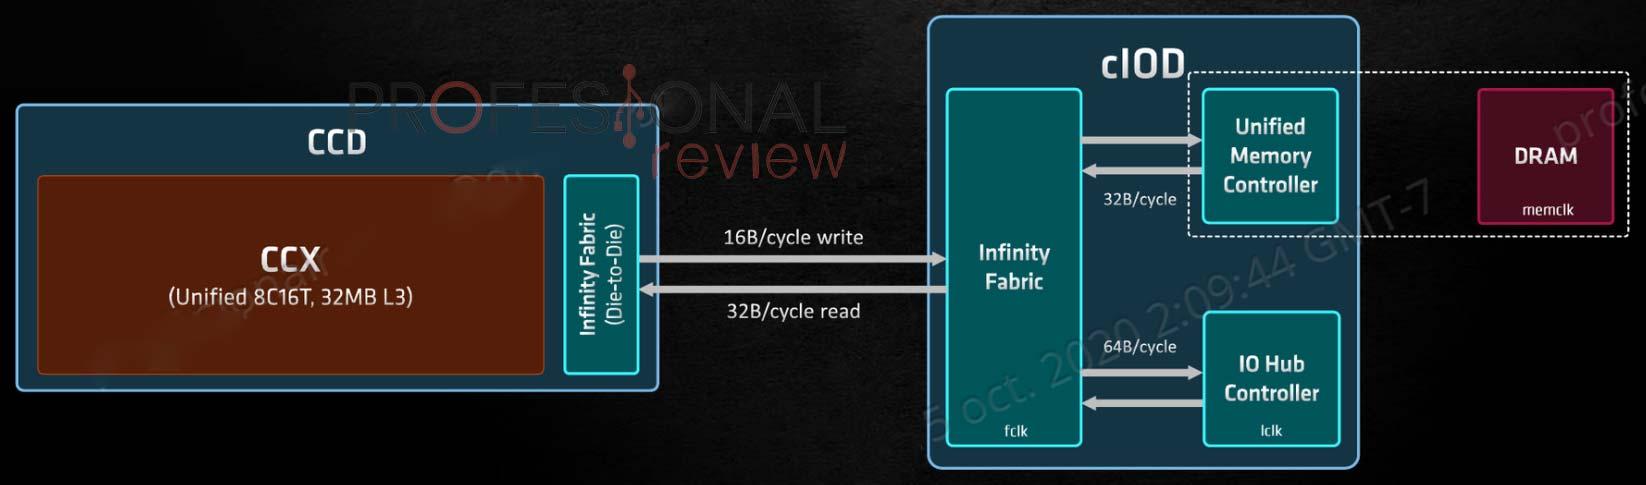 AMD Ryzen 9 5900X Review